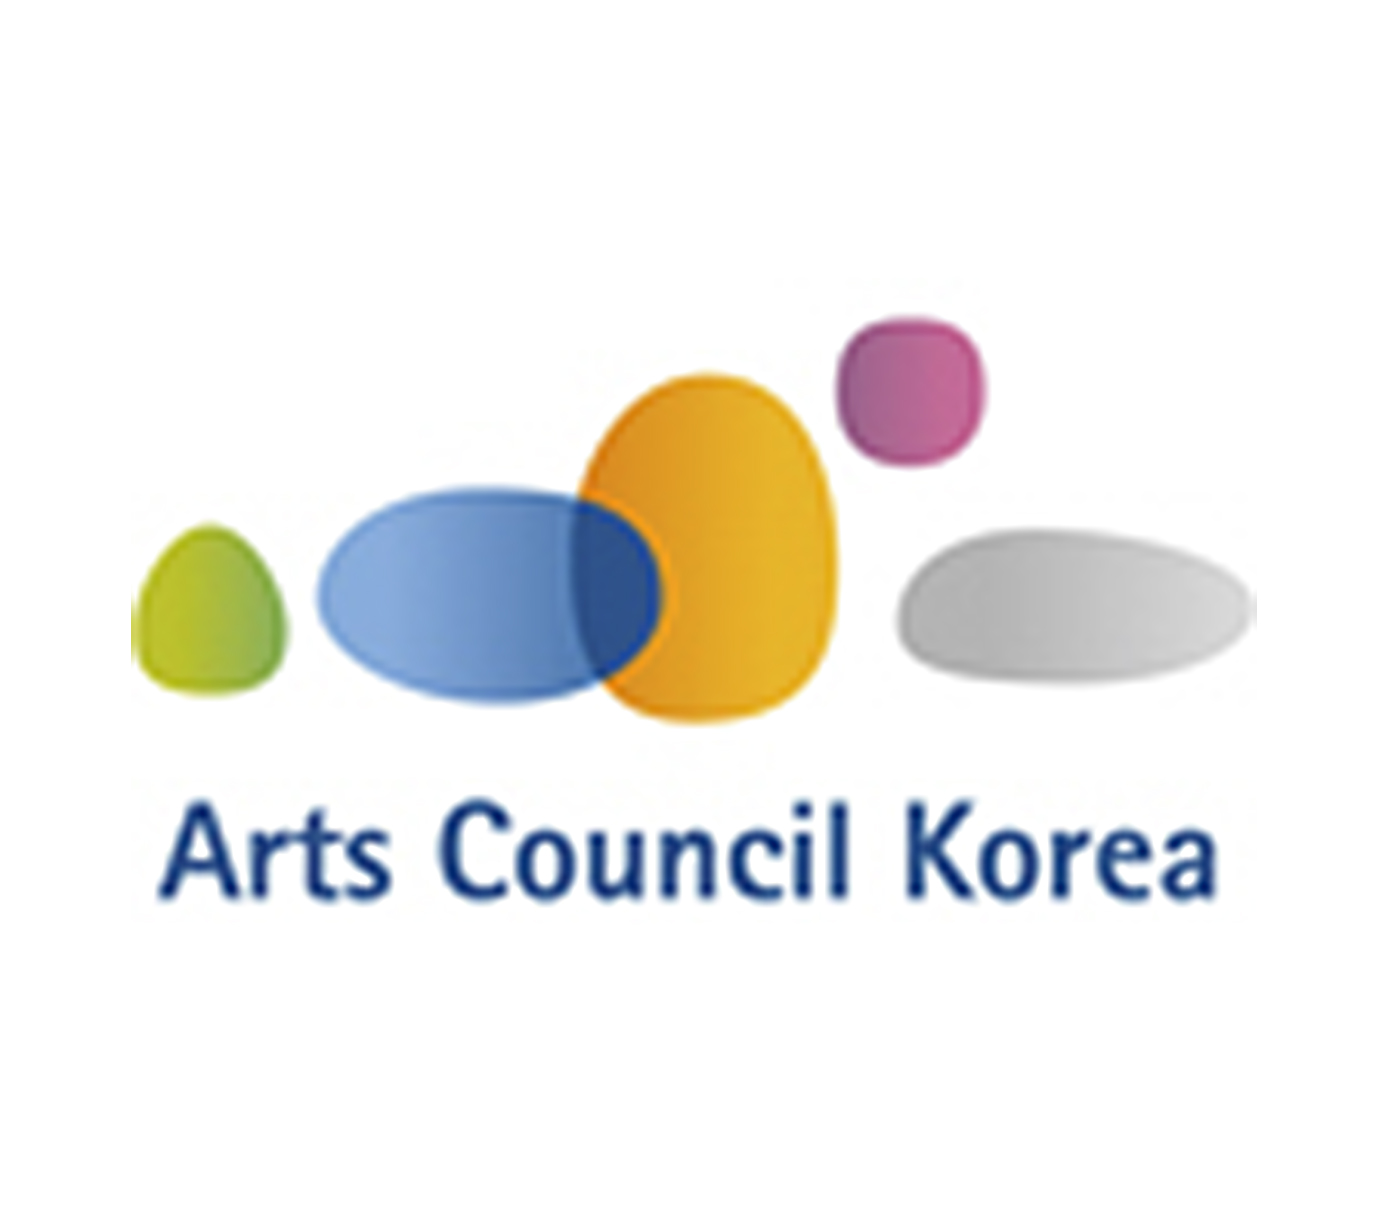 Arts council korea.jpg